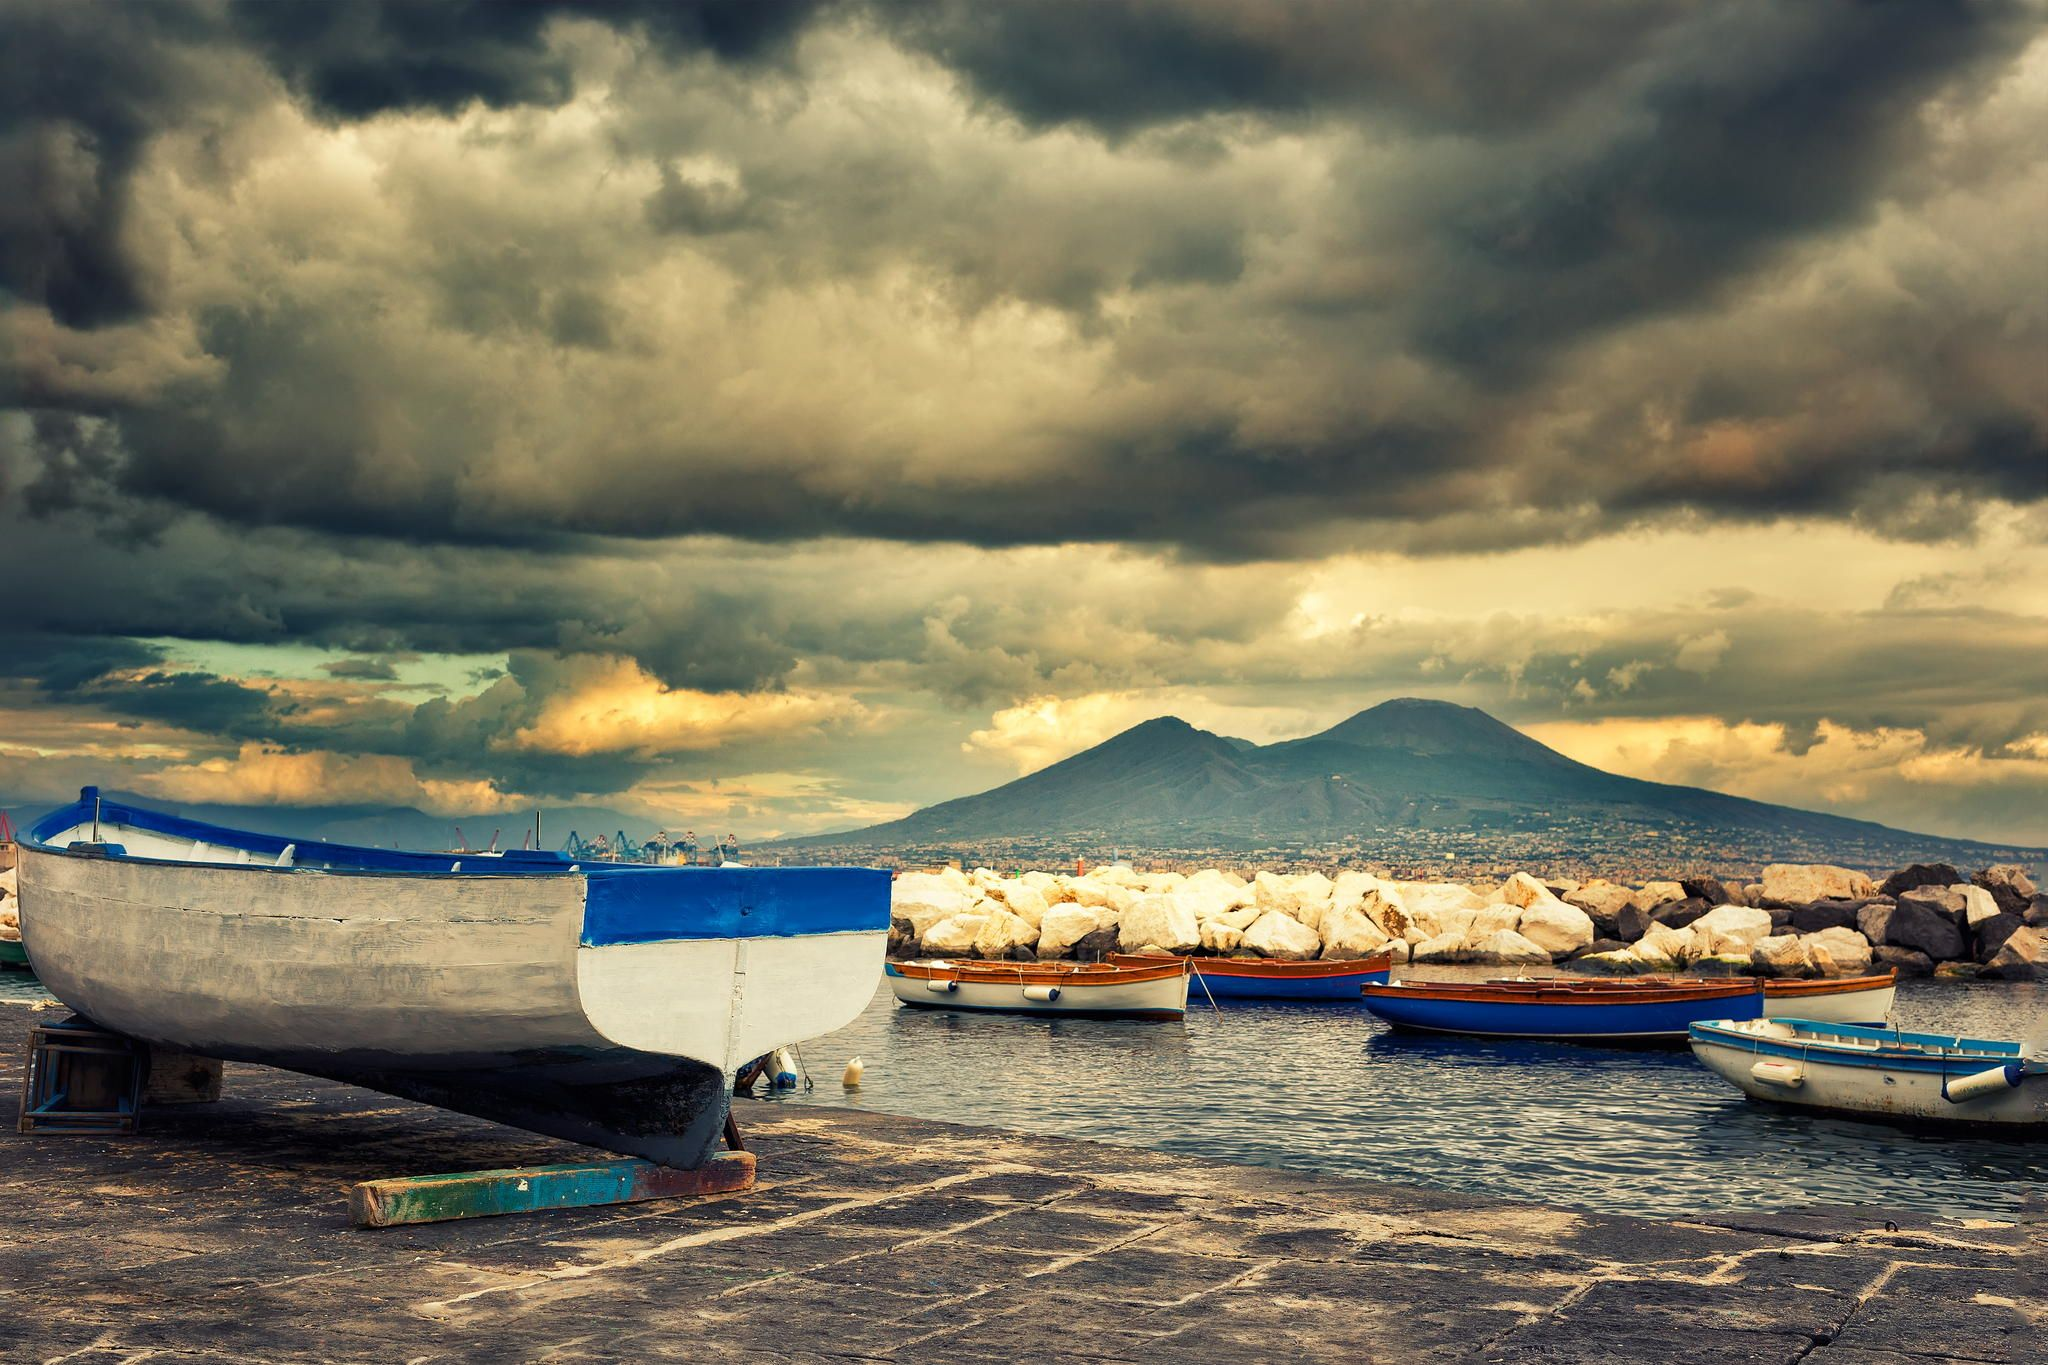 A famous view of Vesuvius volcano from Caracciolo Seafront in Naples by Giorgio Galano